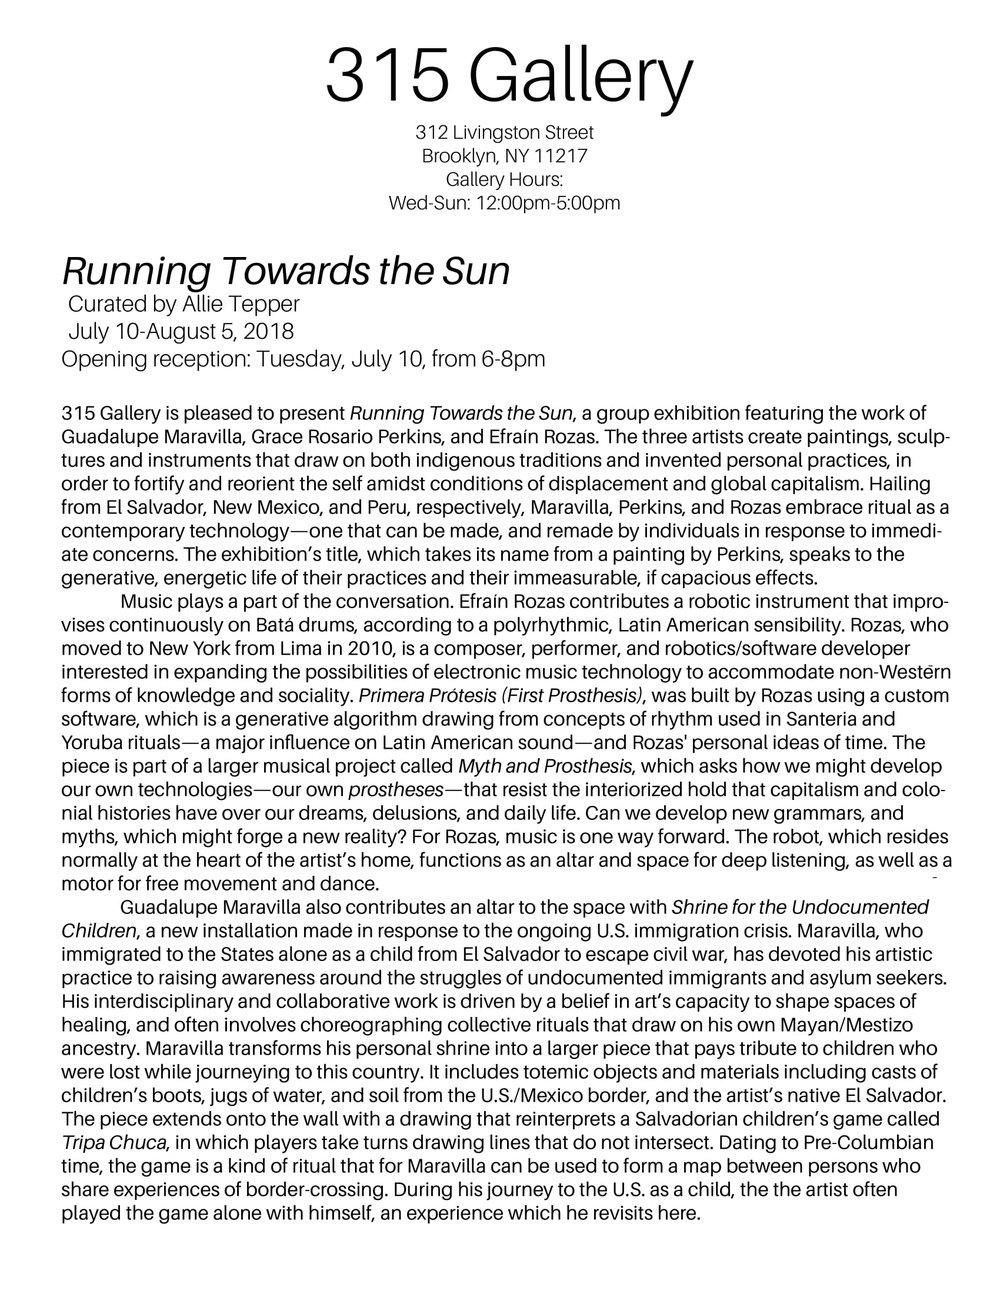 Running Towards the Sun Press Release (dragged)-1.jpg